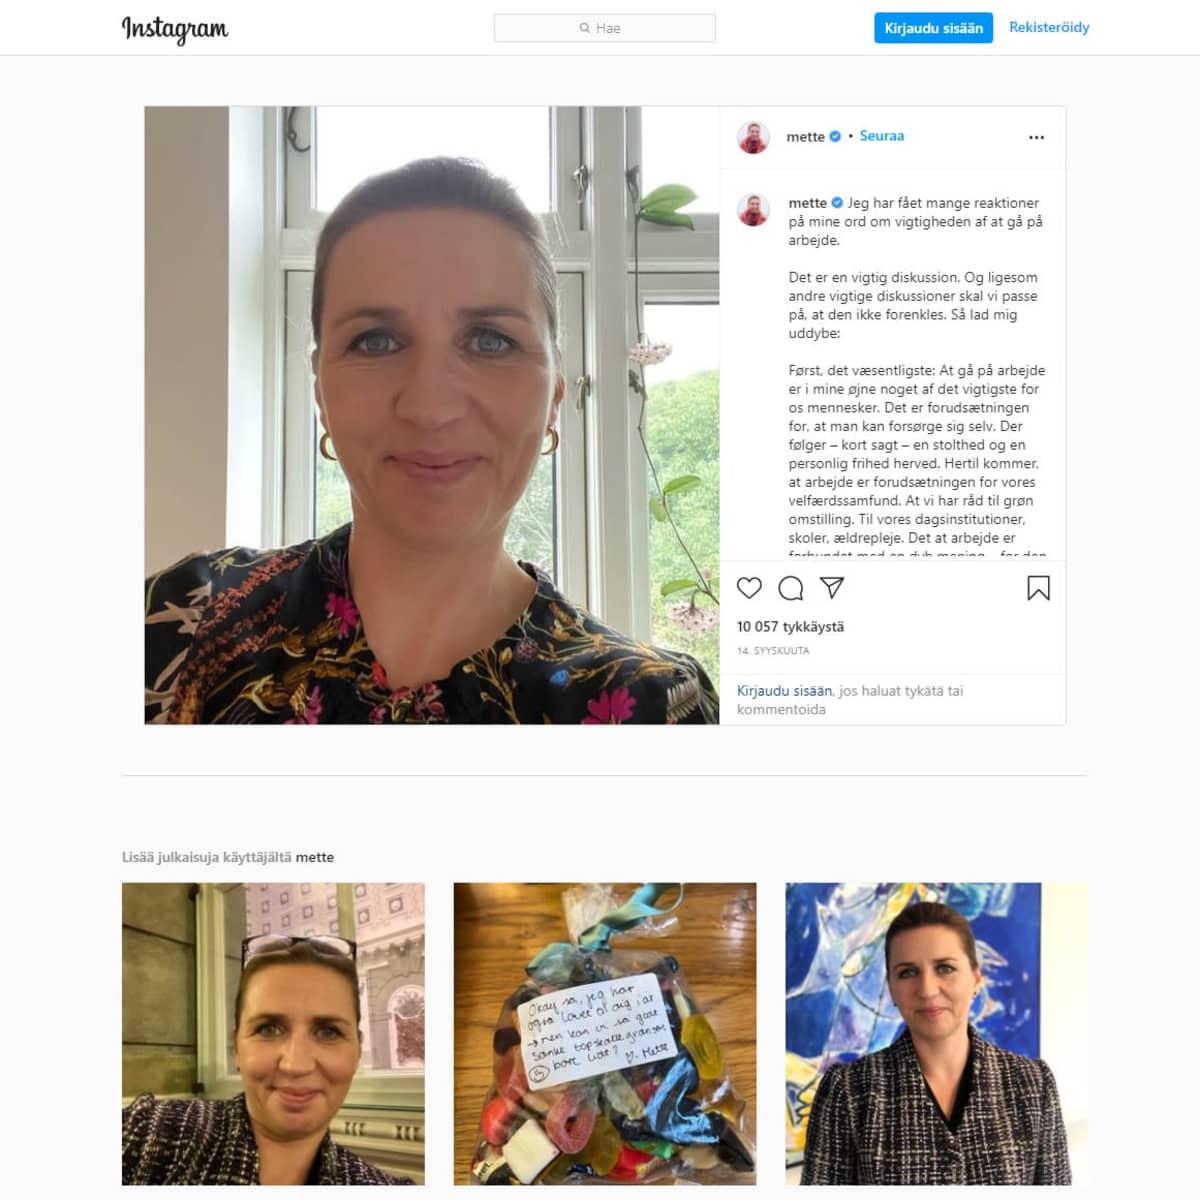 kuvakaappaus Mette Frederiksenin Instagram sivuilta